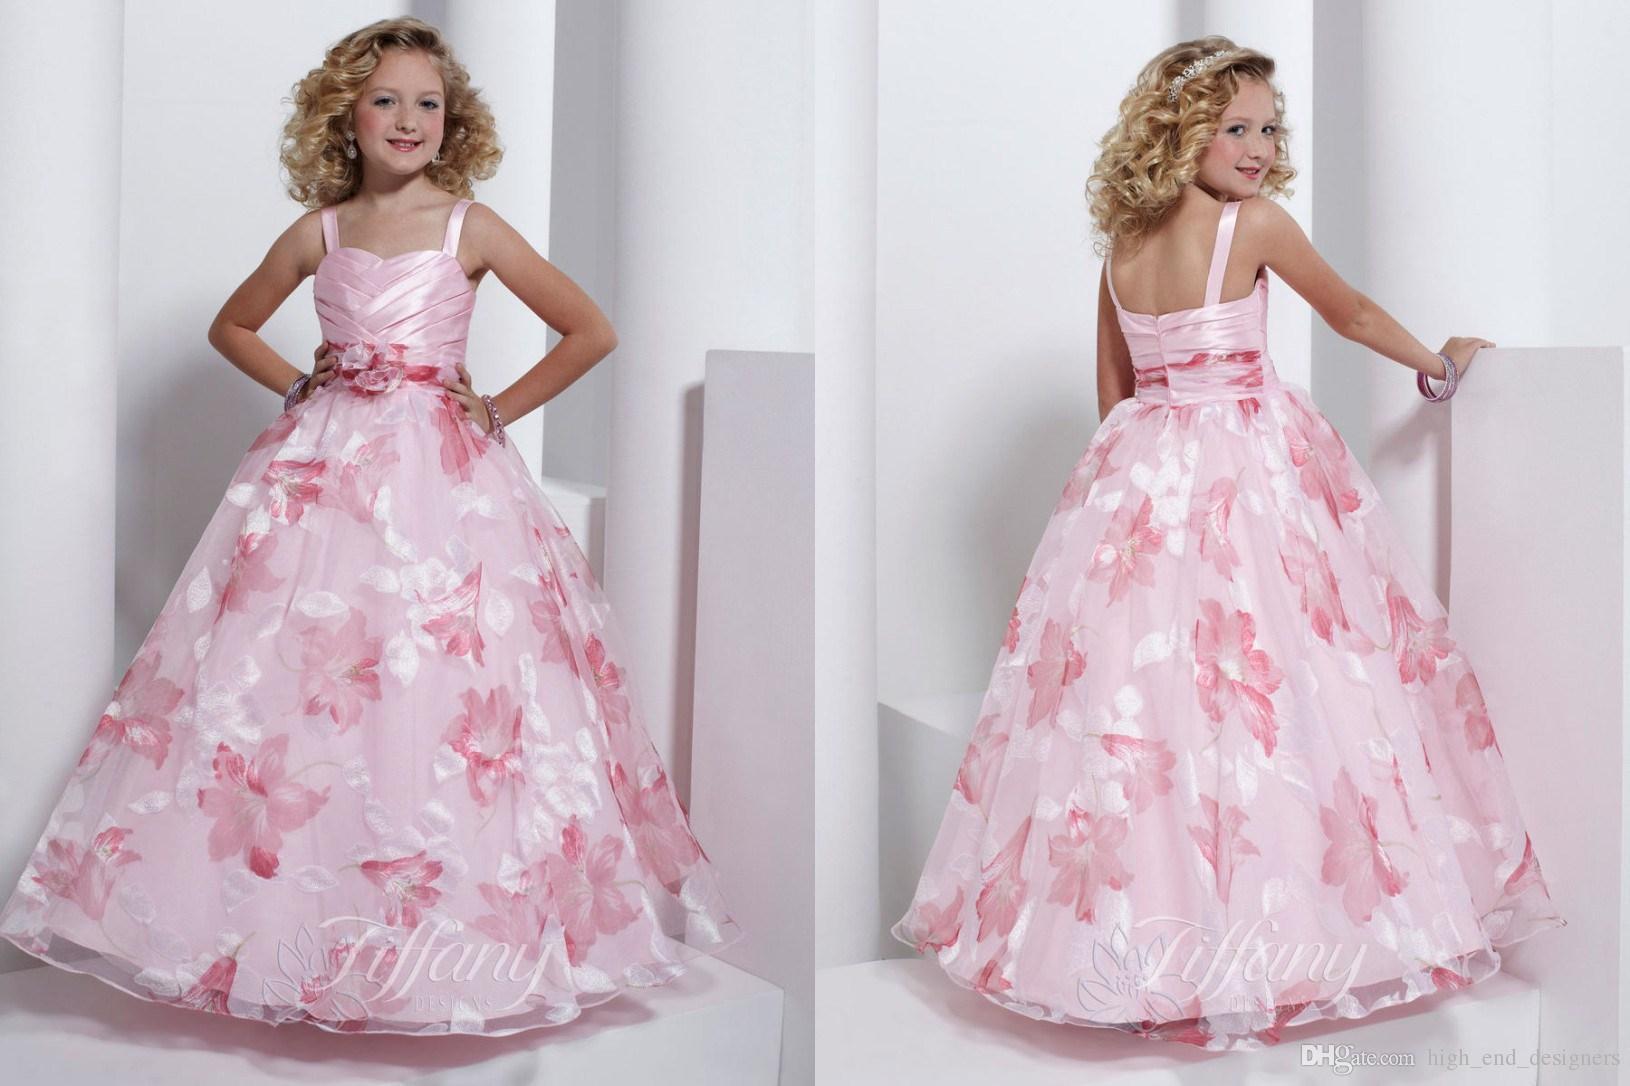 Girls Formal Dress Patterns Price Comparison | Buy Cheapest Girls ...